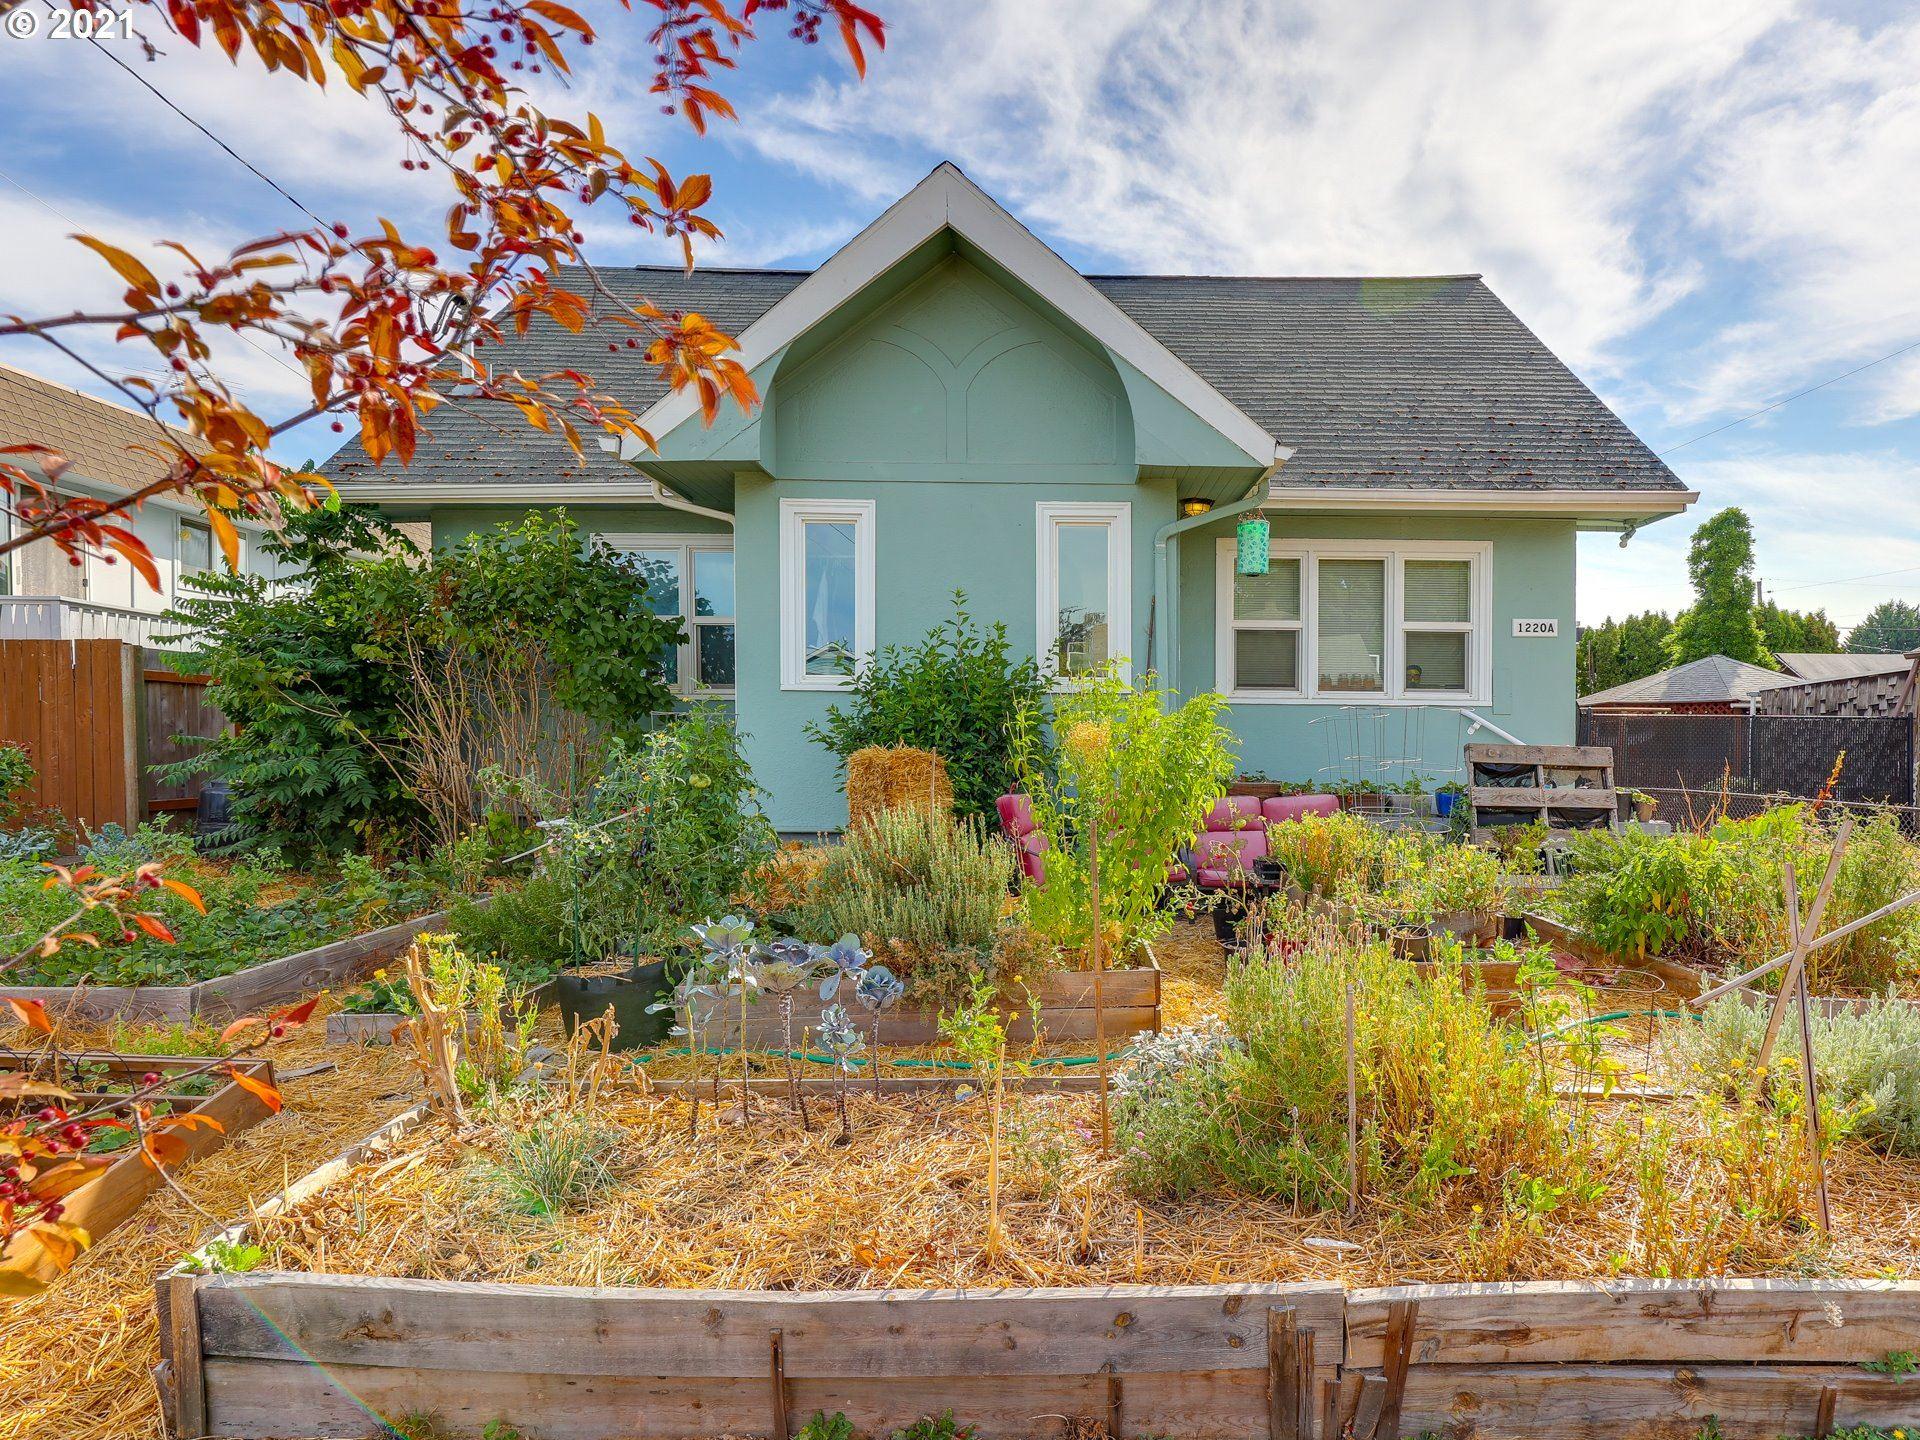 1220 NE 69TH AVE, Portland, OR 97213 - MLS#: 21606113